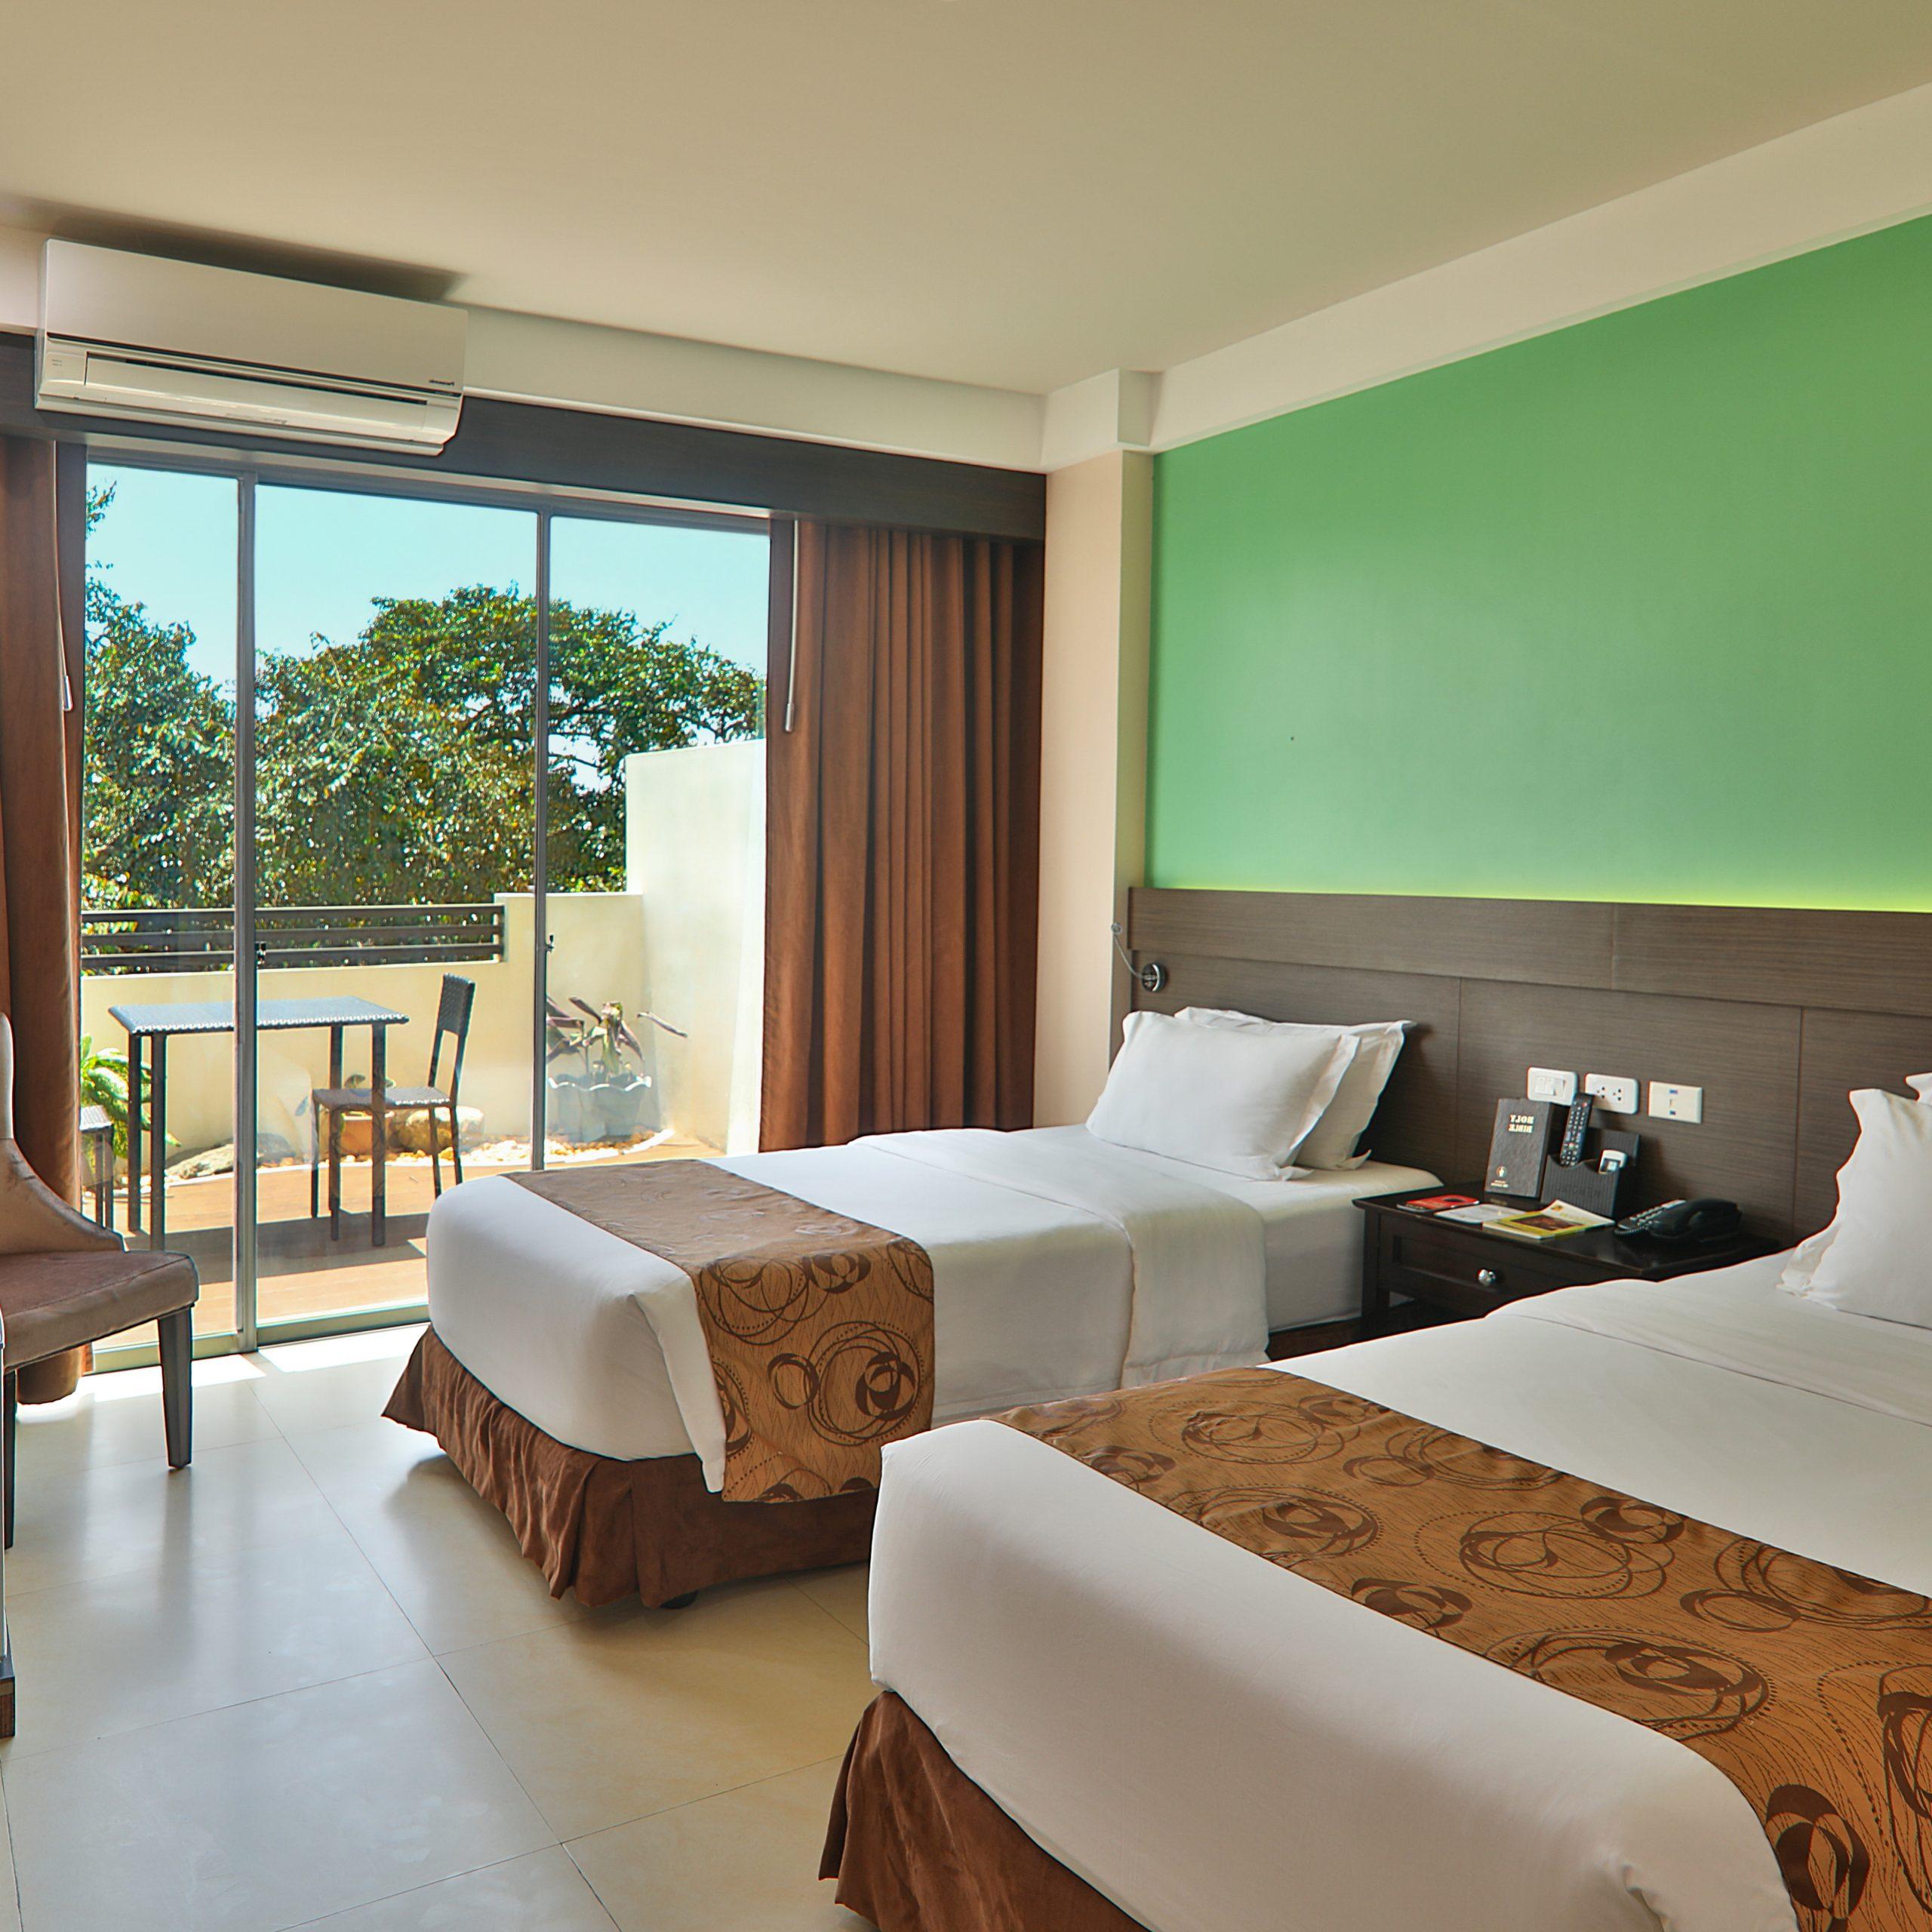 Popular Deluxe Twin – Kew Hotel – Tagbilaran Throughout Merryman (View 4 of 6)